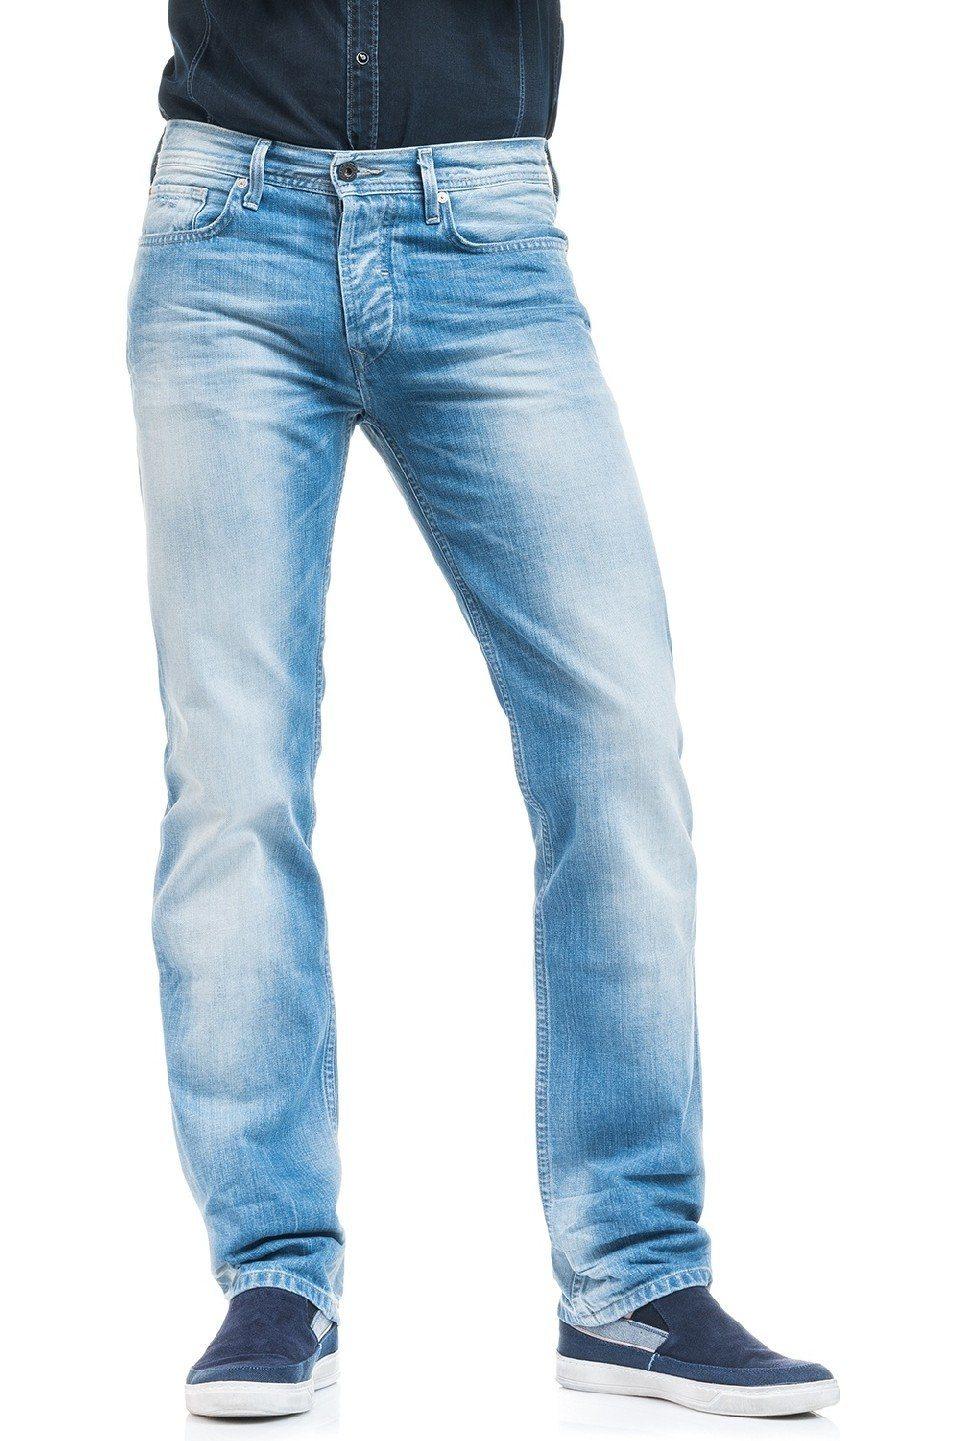 salsa jeans Jean »Regular/ Navarro«